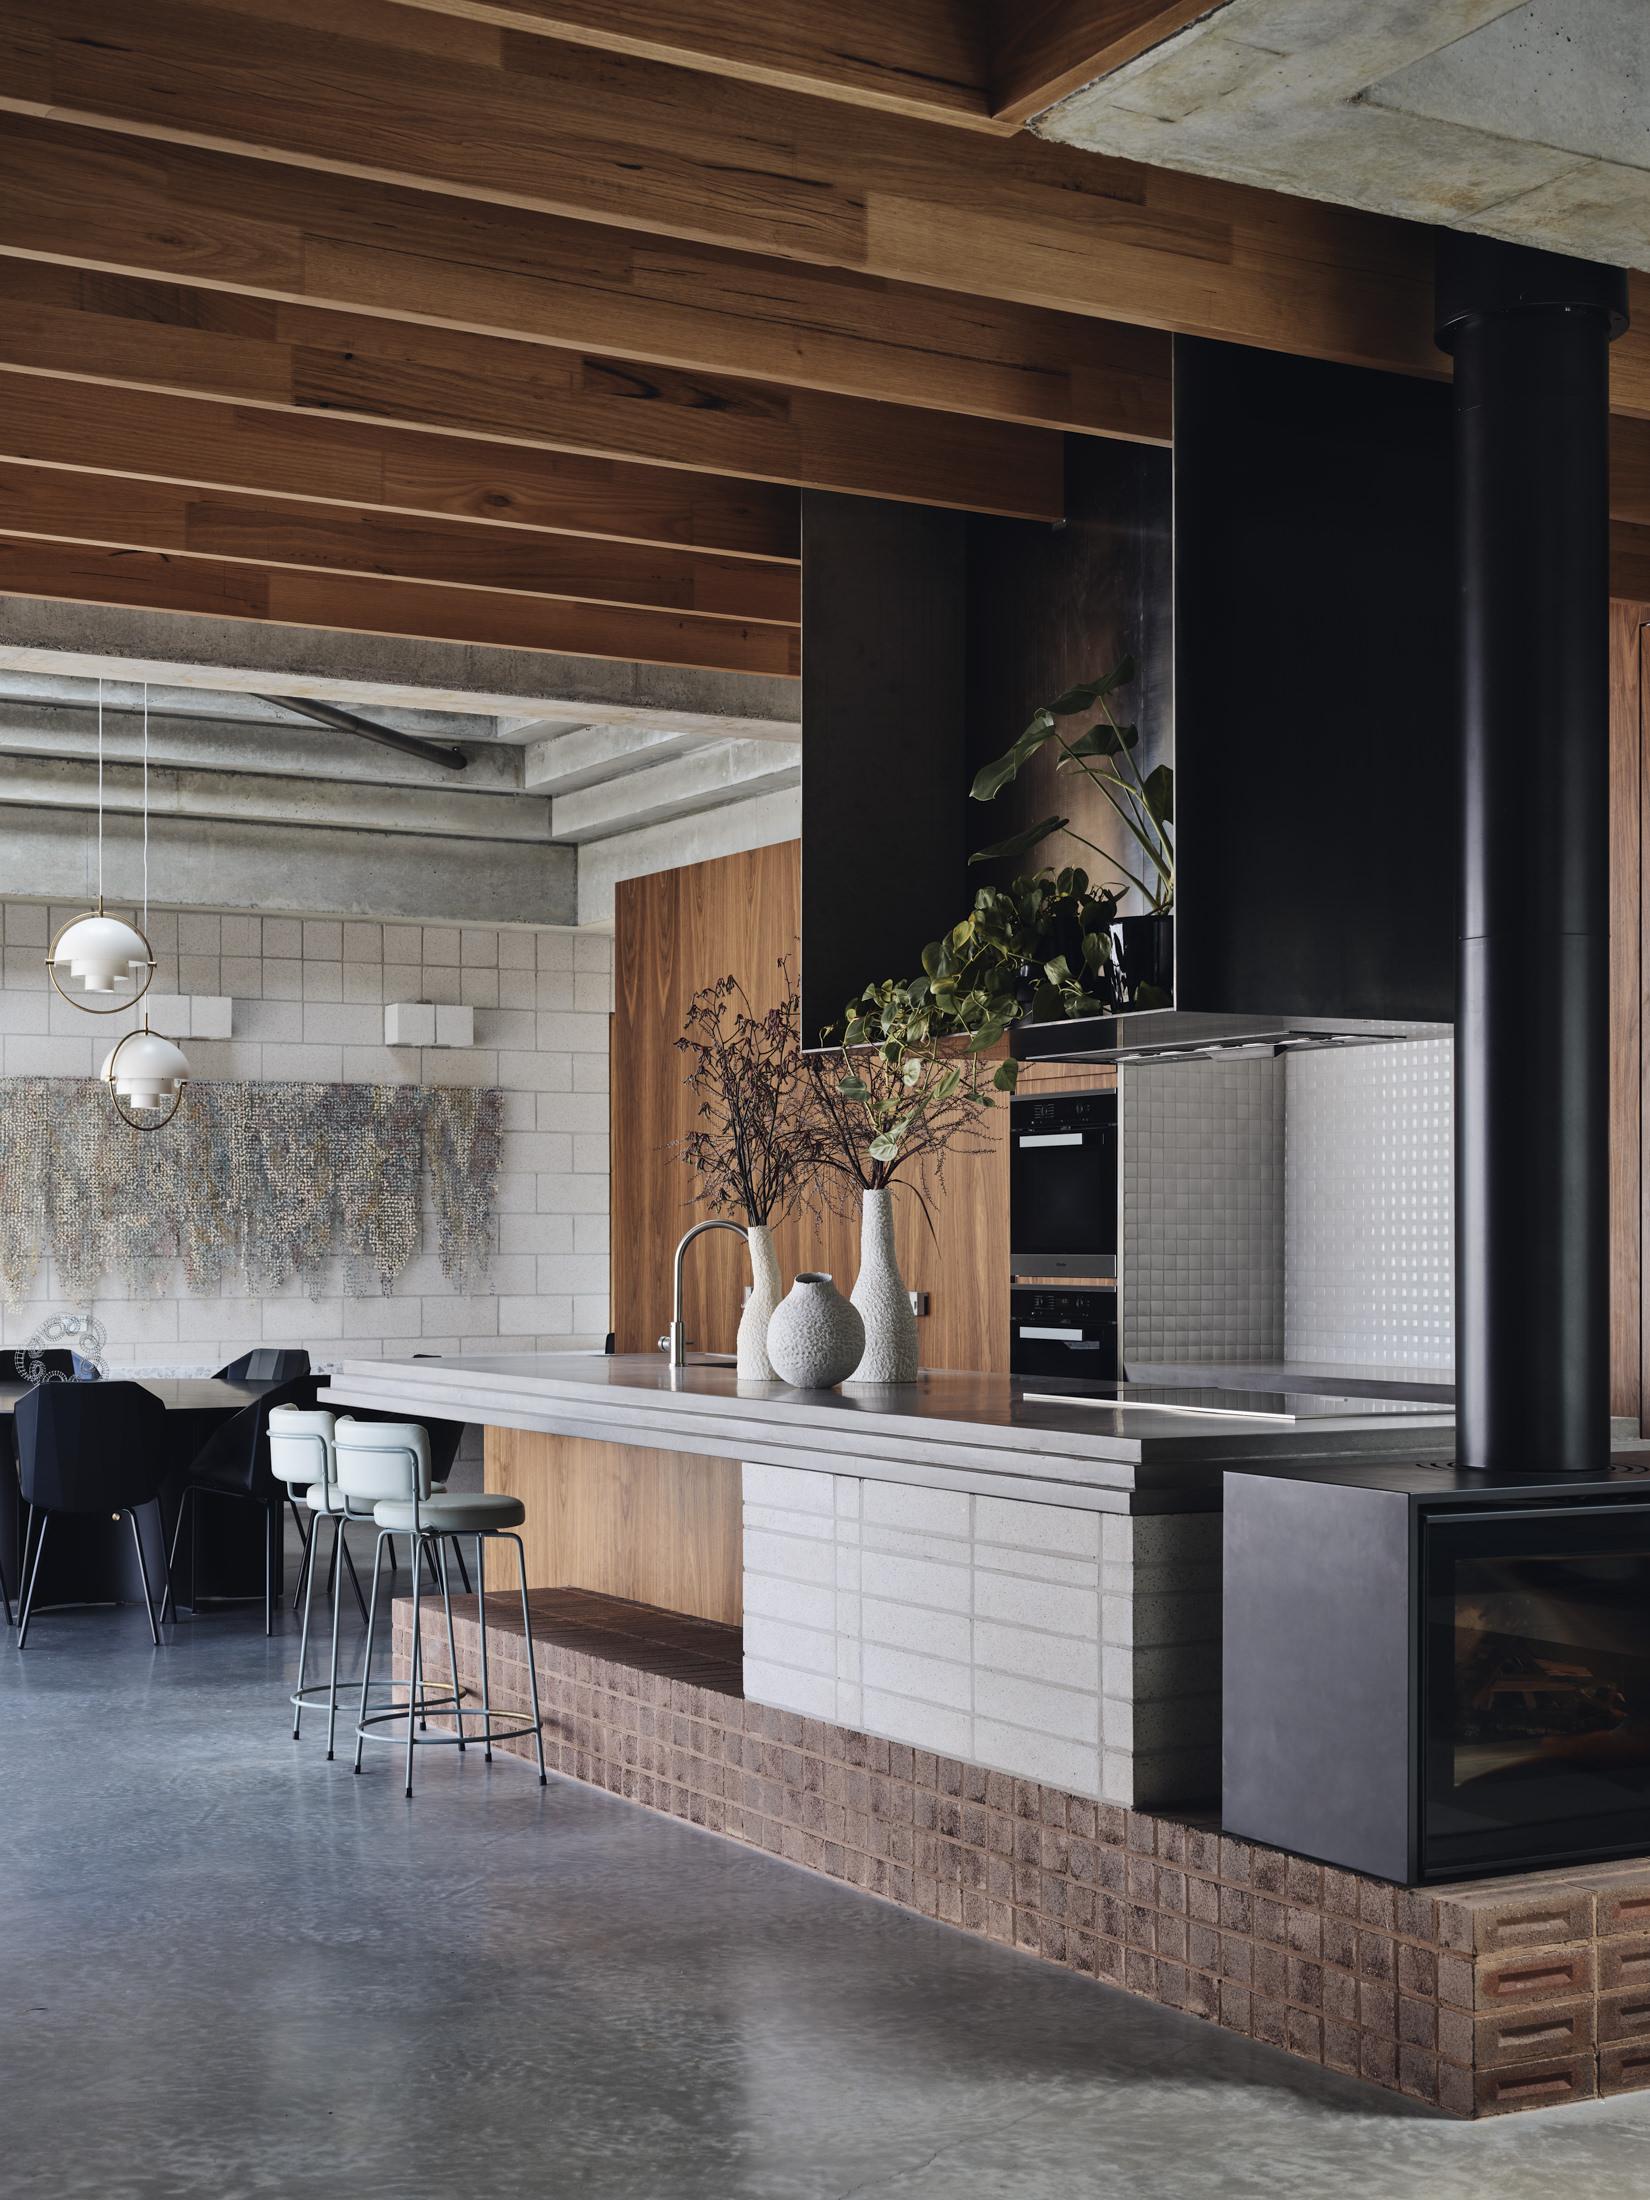 Architects Eat Bellows Beach House Flinders Masonry Architecture Photo Derek Swalwell Yellowtrace 25